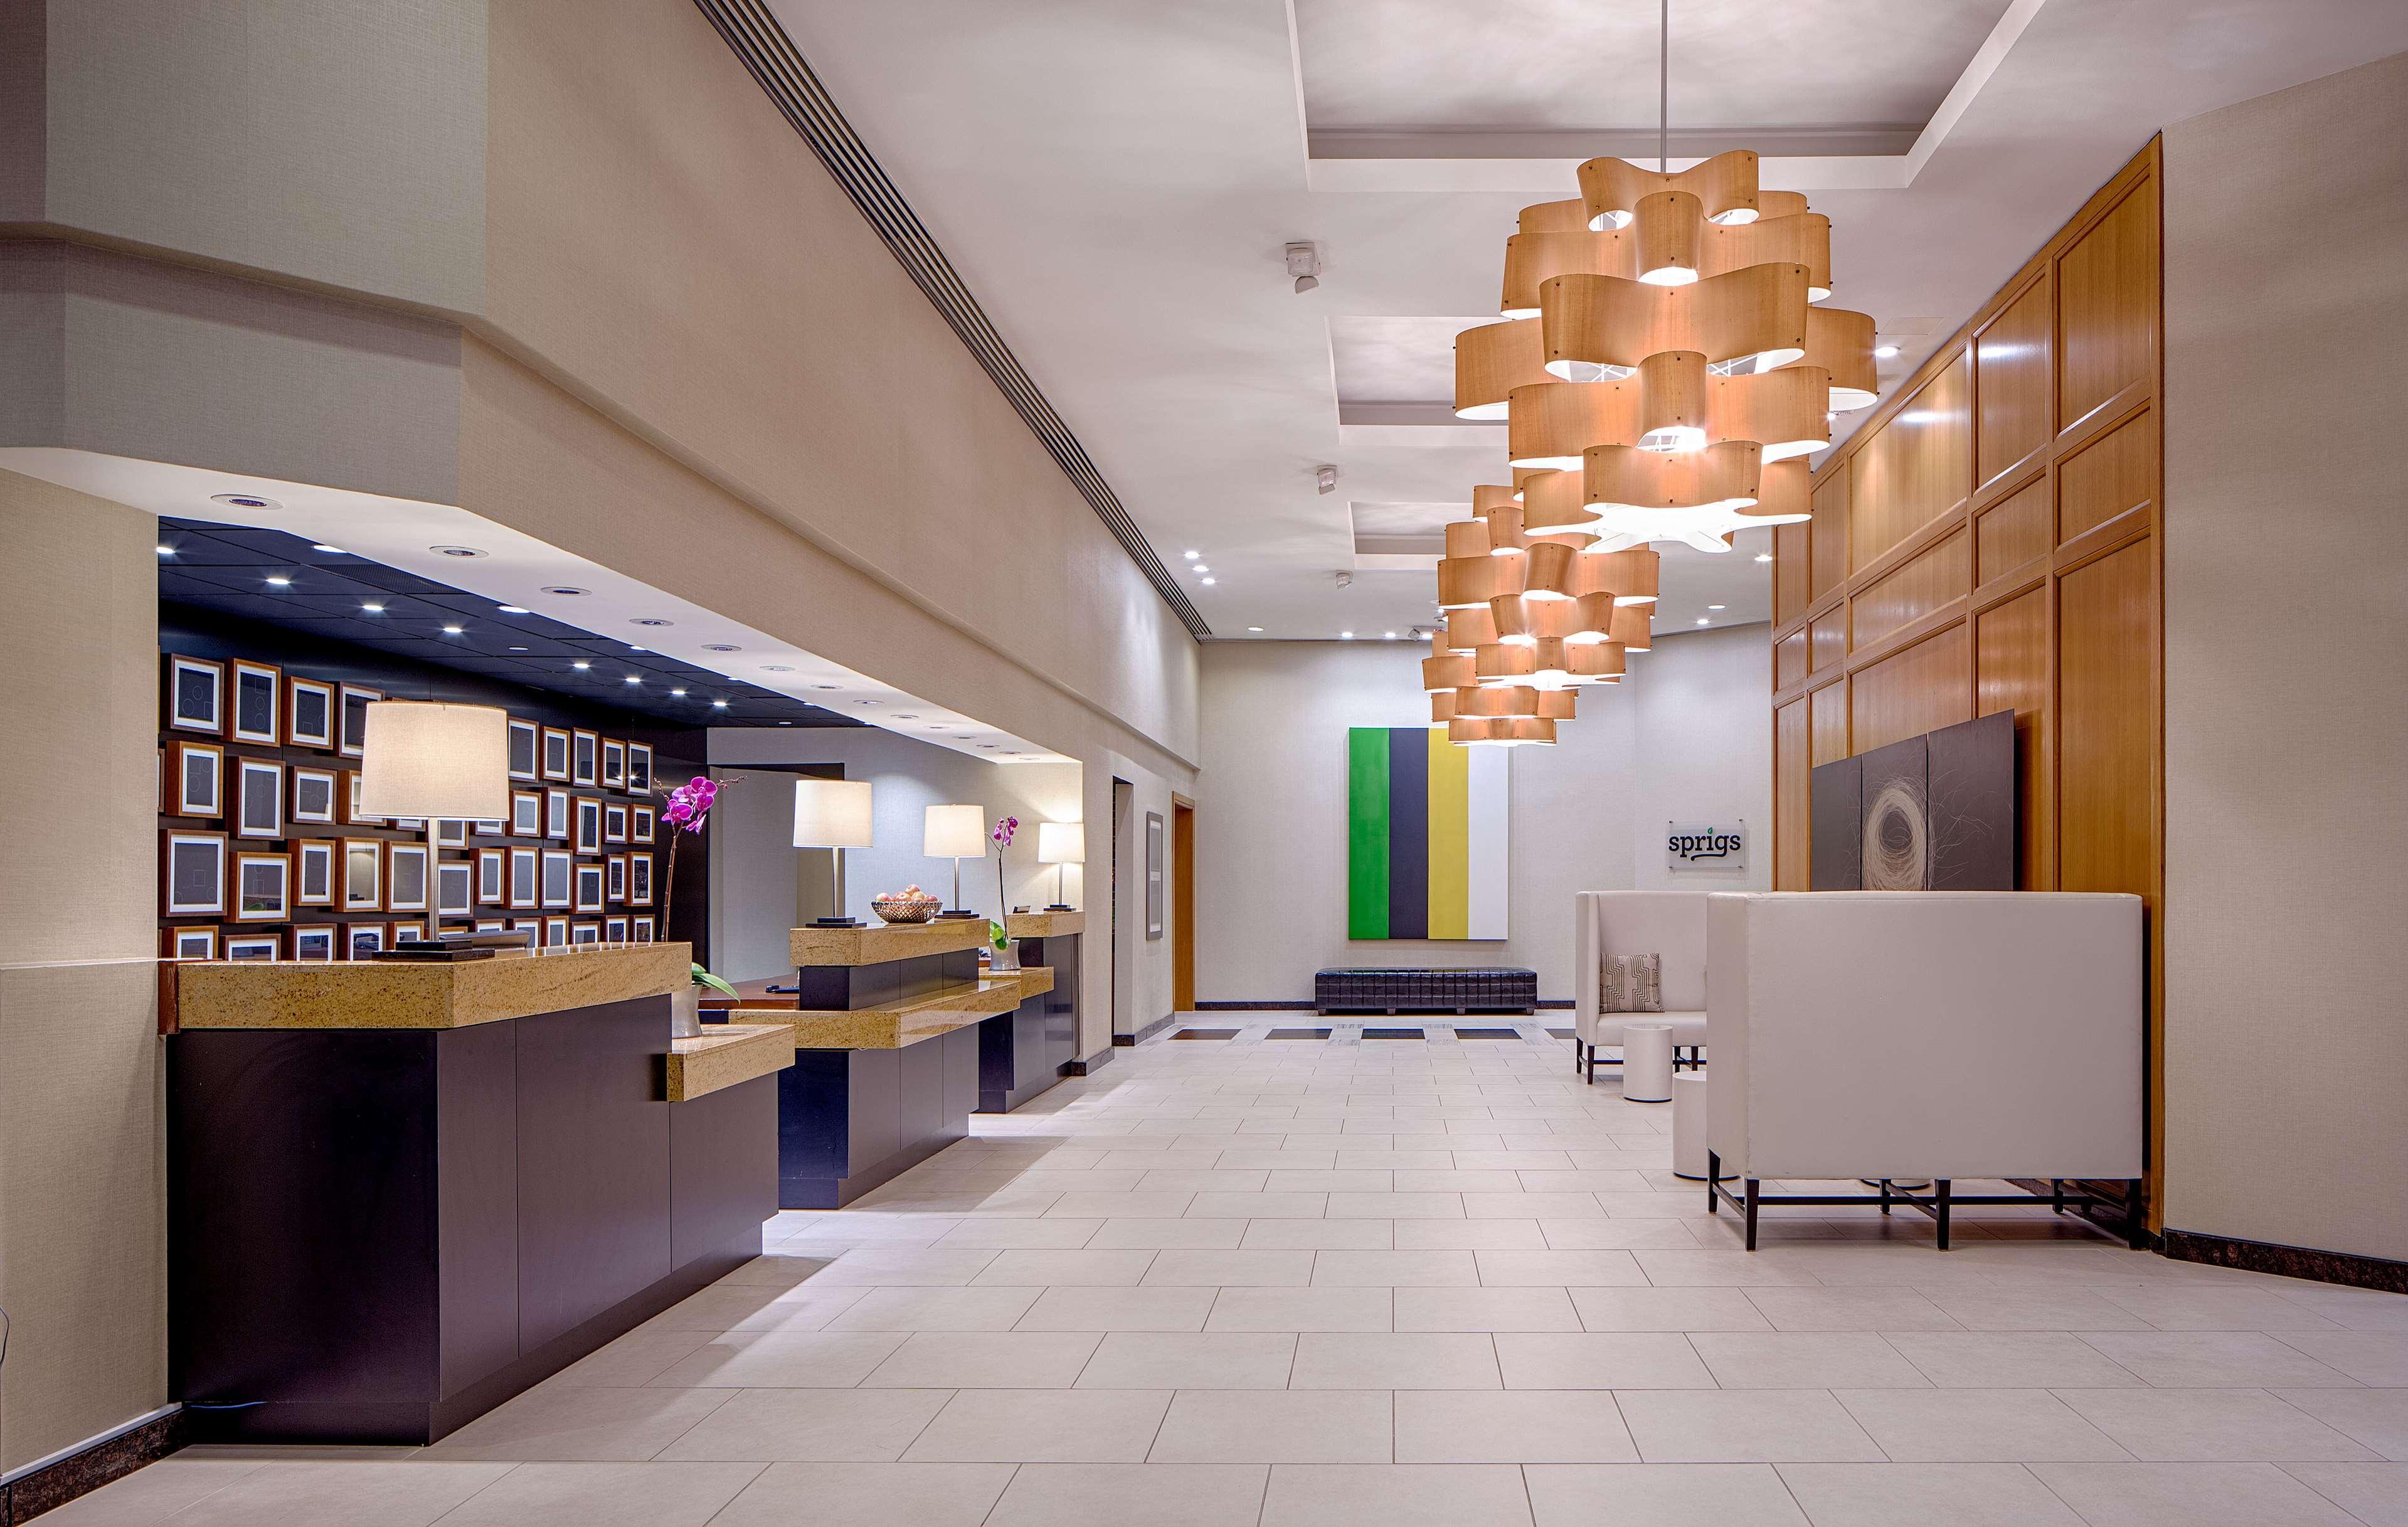 DoubleTree by Hilton Hotel Houston - Greenway Plaza image 2